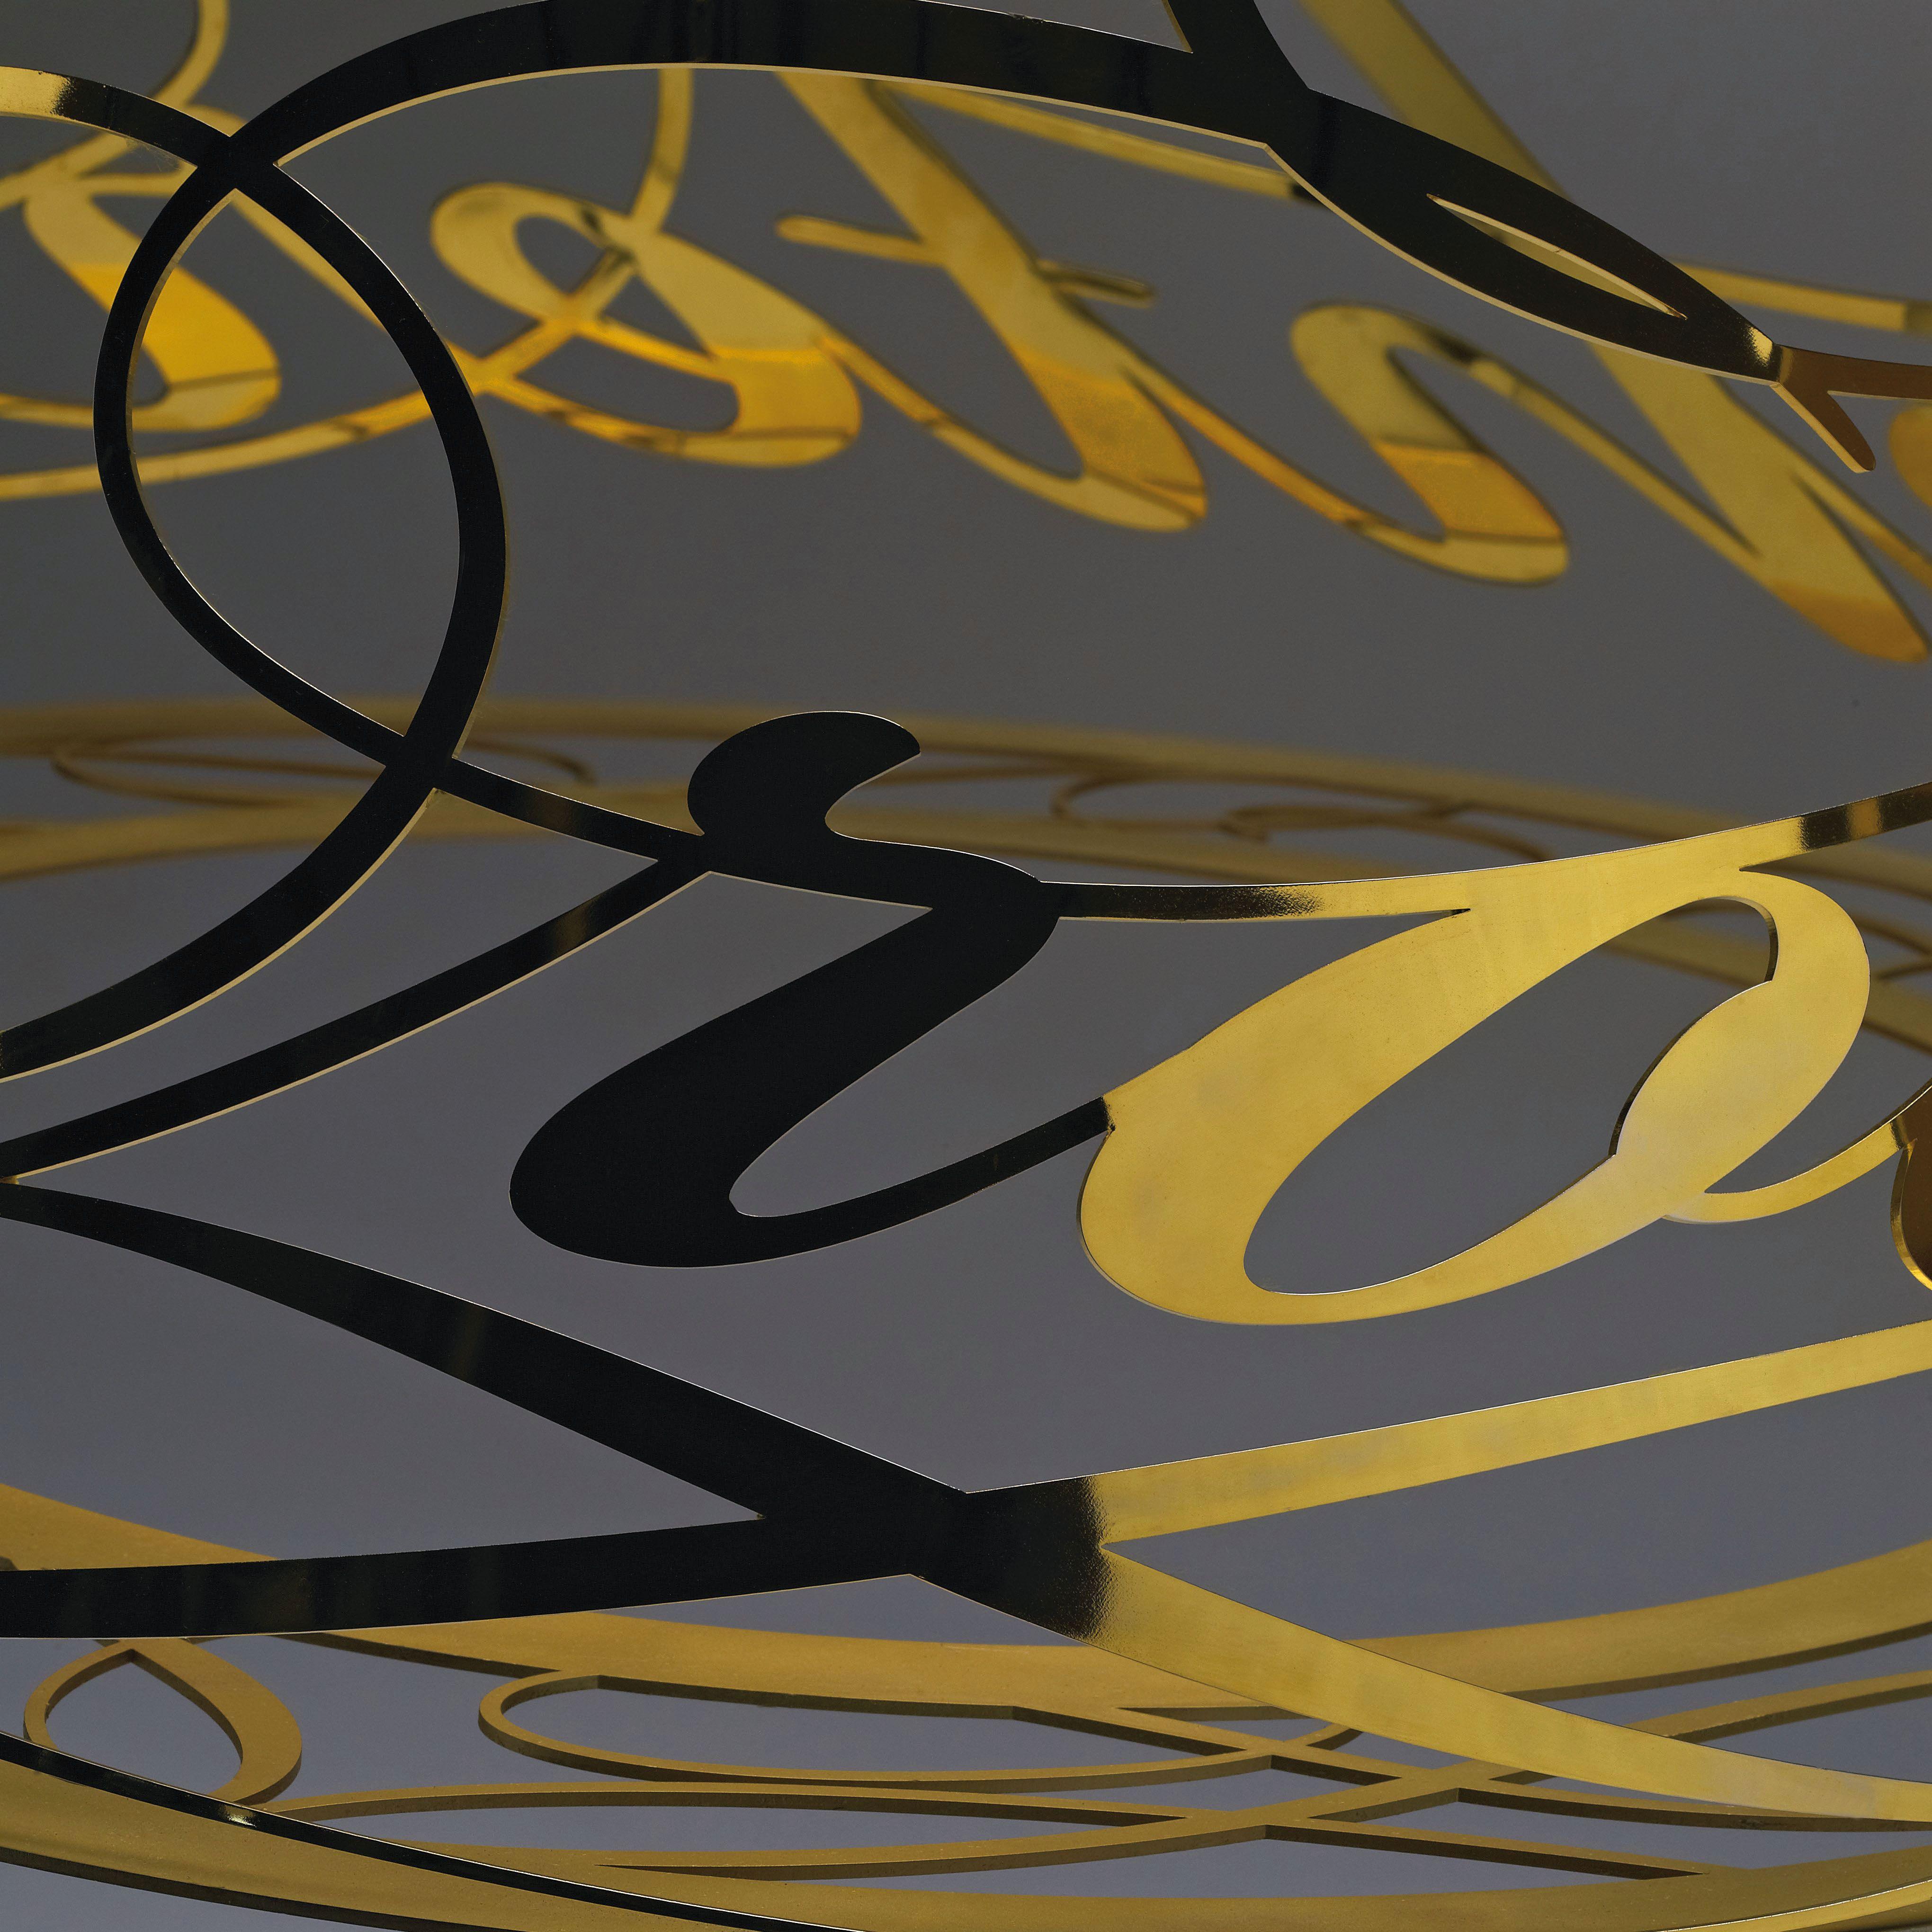 Idée Fixe detail in gold. By Jacco Maris. #dutch #design #steel  #jaccomaris #jaccomarisdesign #Breda #handmade #lights #lightfixture #lamps #interior #lightfixtures #interiordesign #armaturen #designhanglamp #designlampen  #lampen # ideefixe #suspension #suprisingly shadow #gold